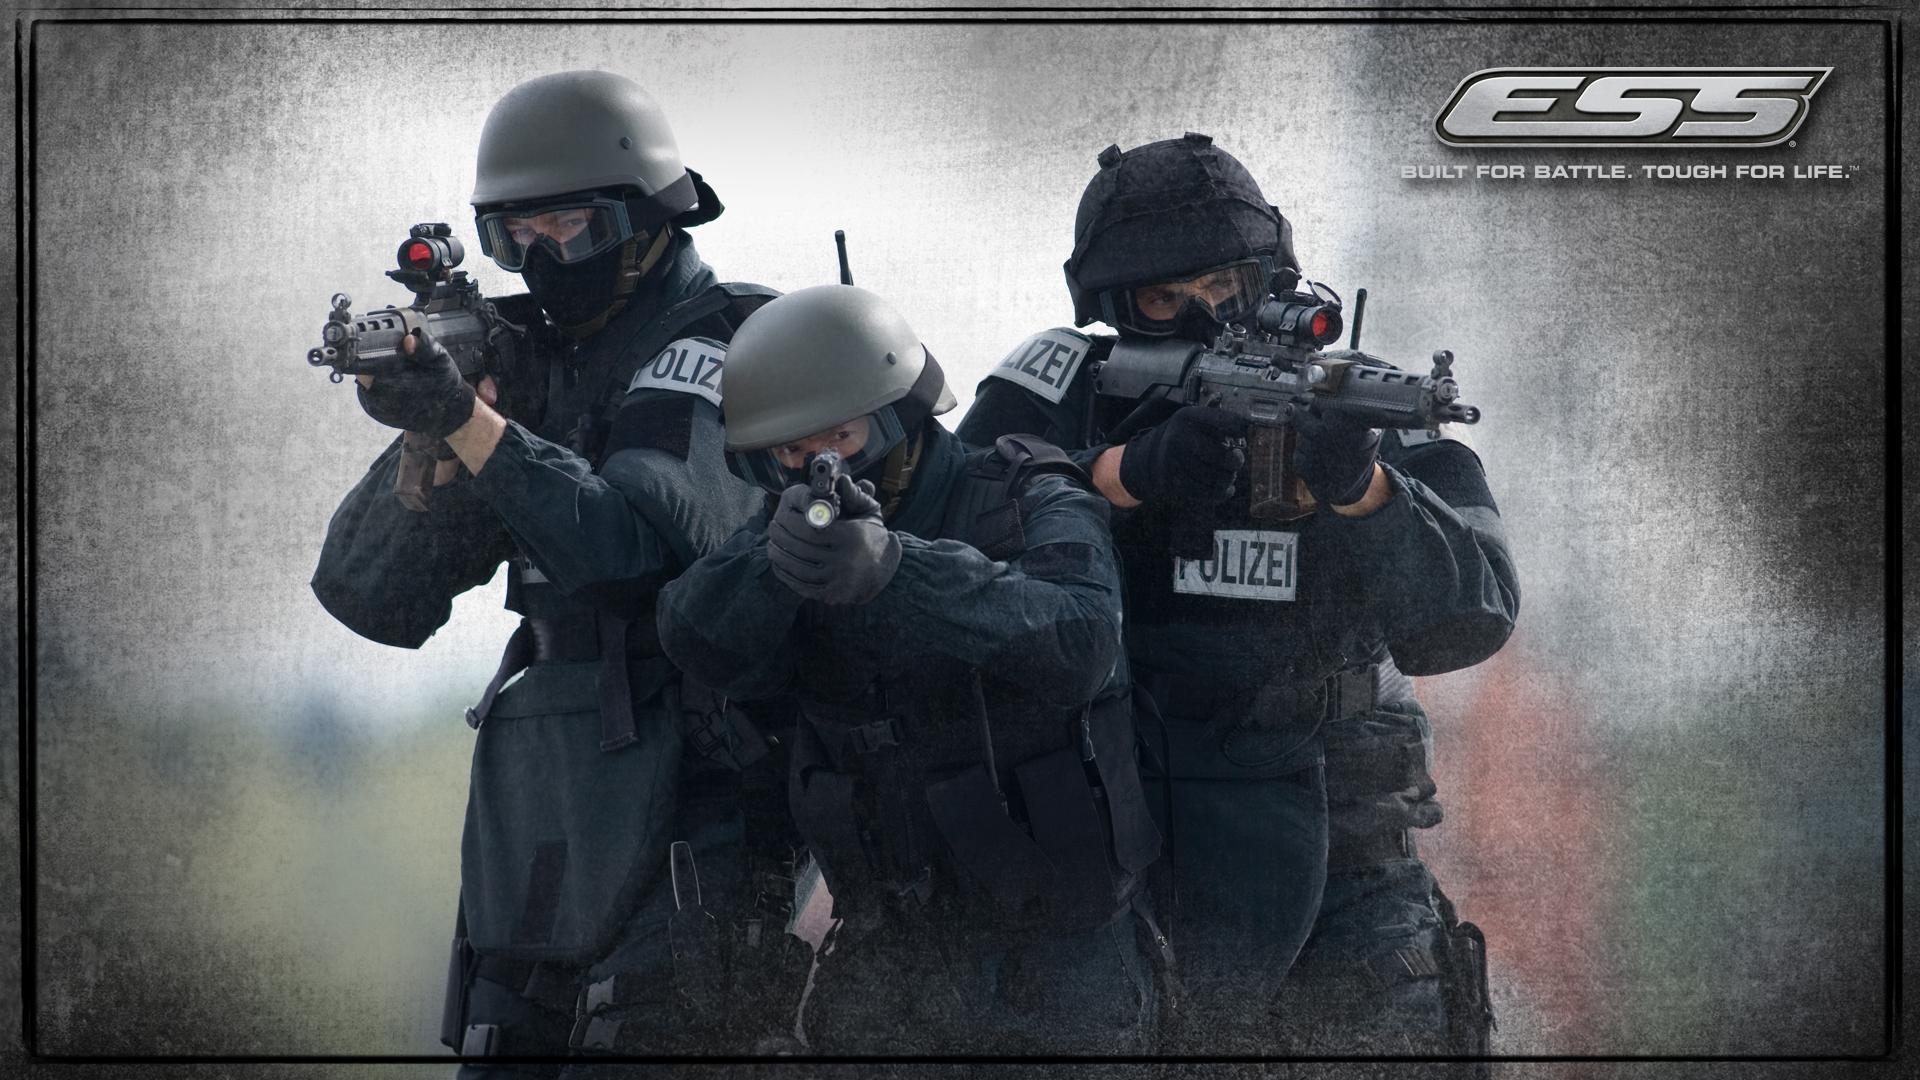 download swat team hd wallpaper 4k hd desktop wallpapers - HD1920×1080